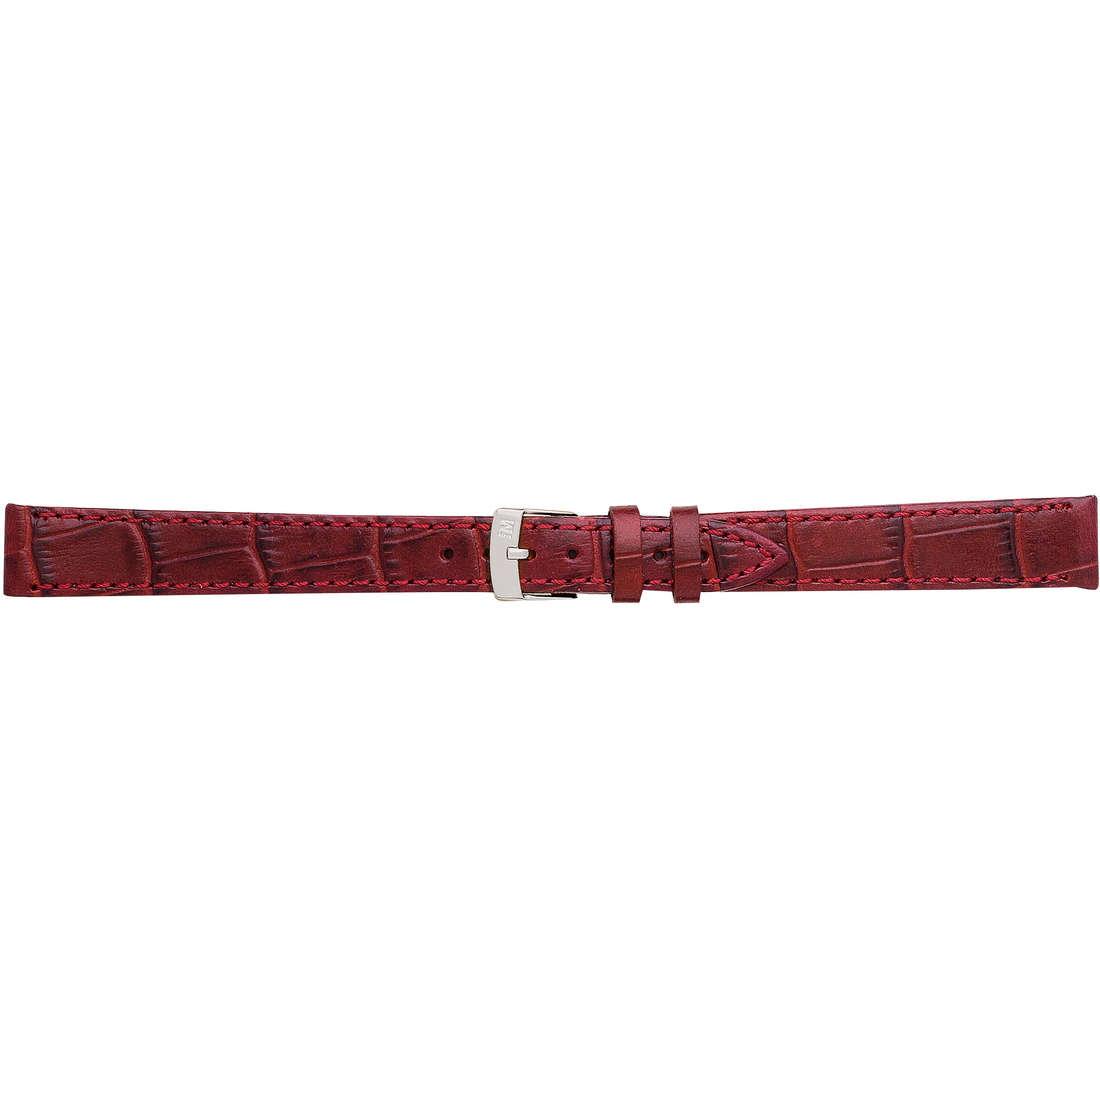 montre bande de montres unisex Morellato I Lunghi A01Y2524656081CR18